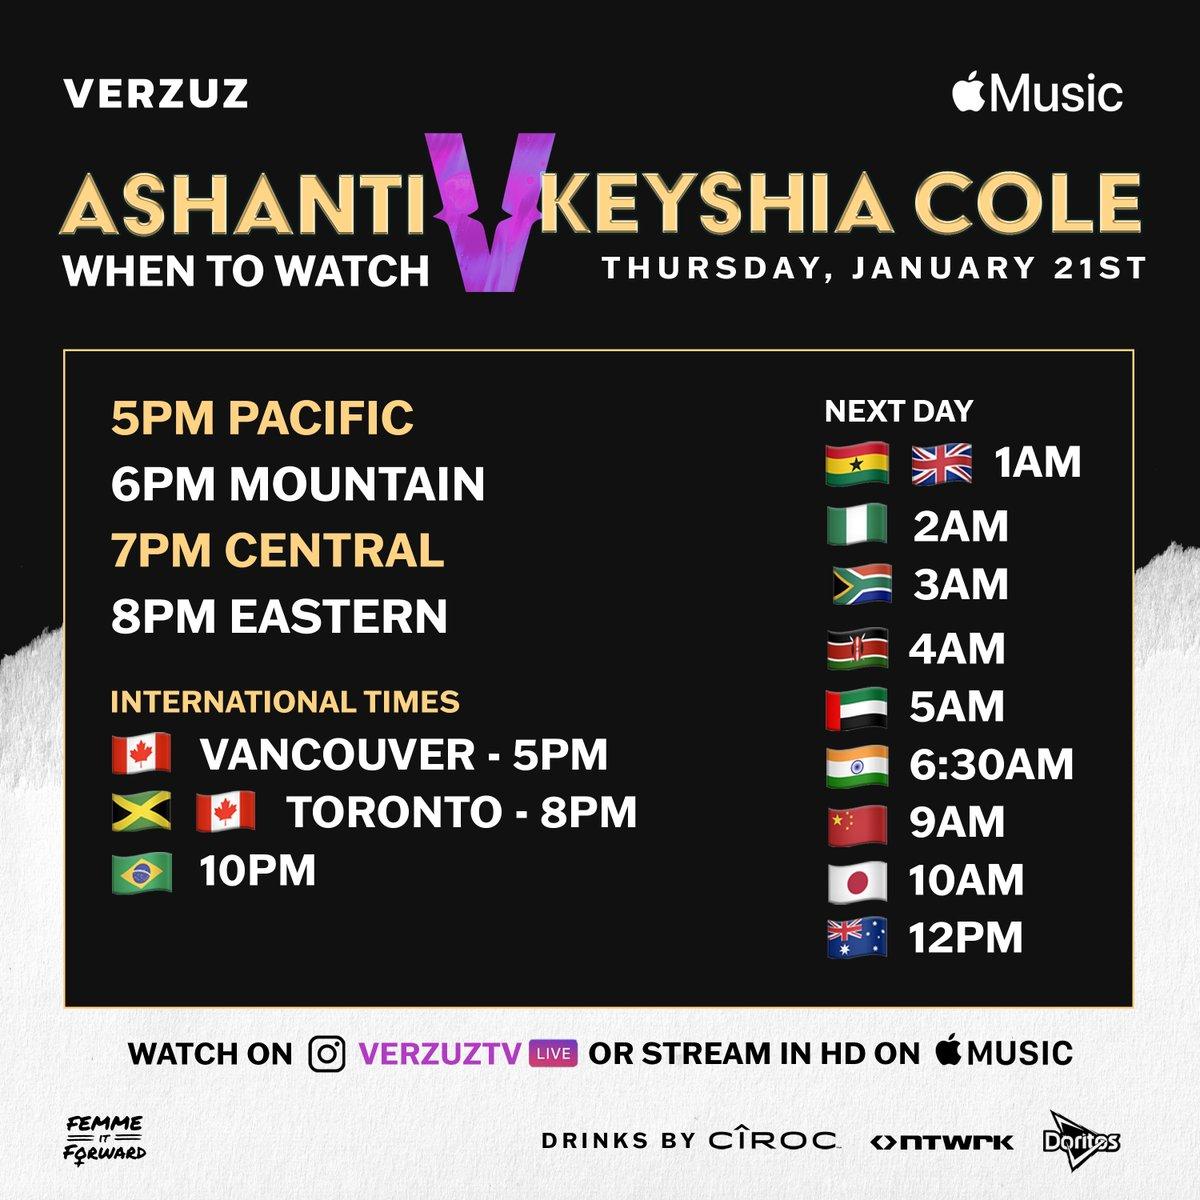 WHEN to watch tonight's #VERZUZ with @Ashanti and @KeyshiaCole 🔽